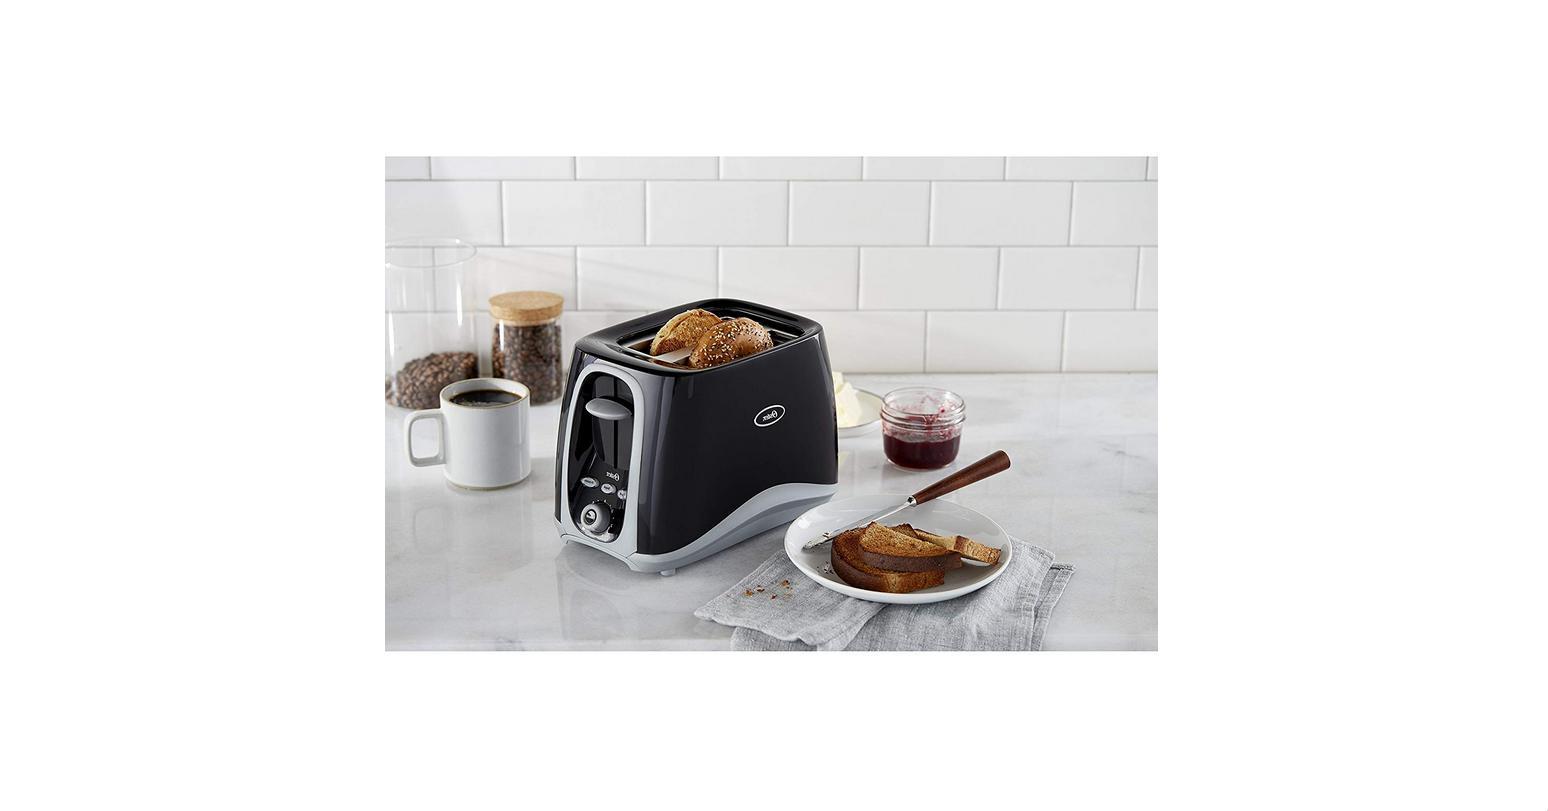 Oster 6332 2-Slice Toaster -